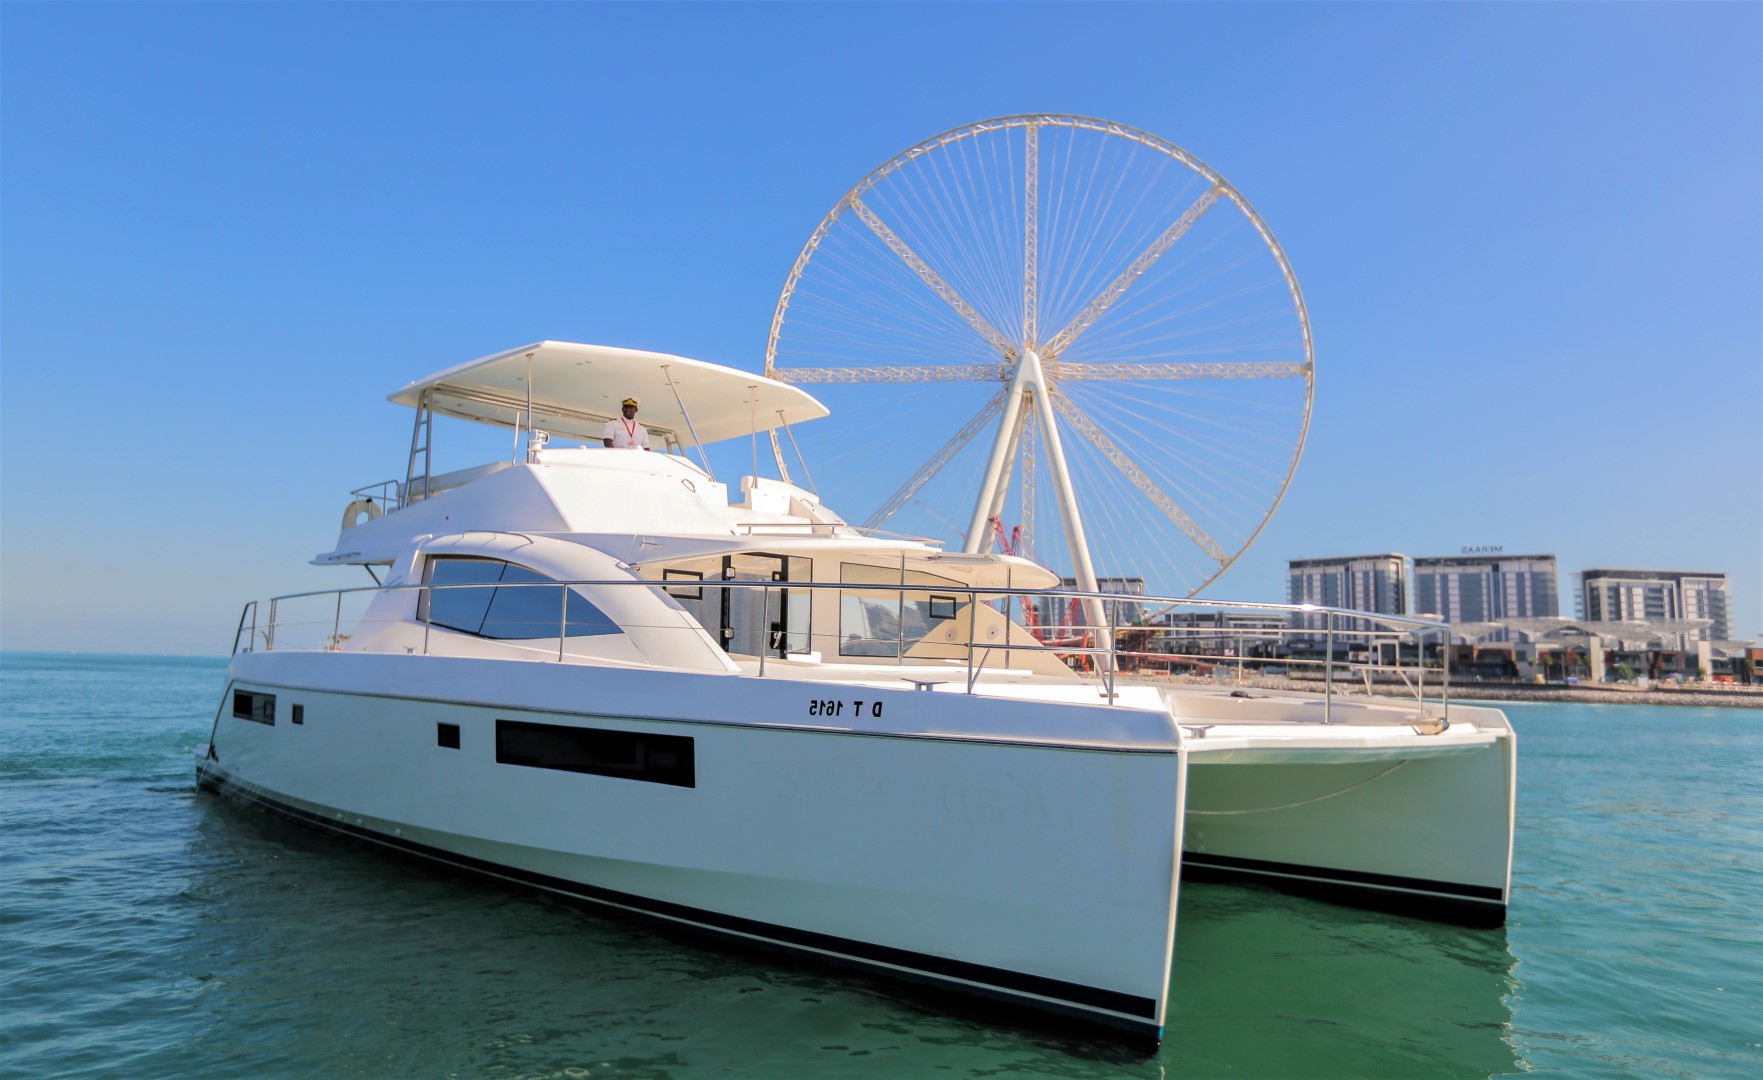 catamaran with ain wheel on background